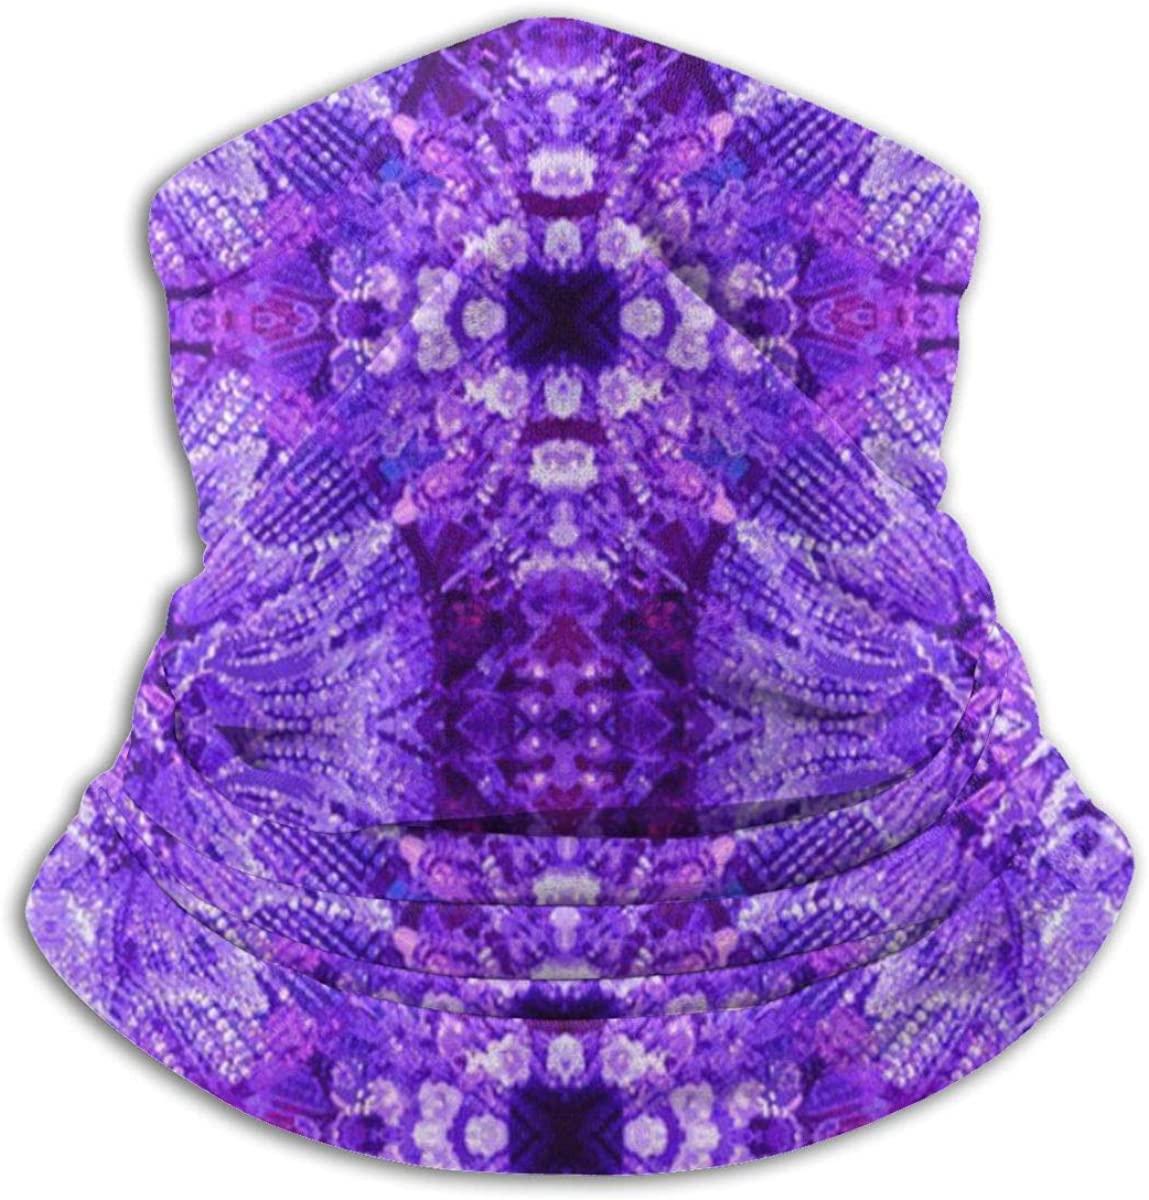 Glows in The Dark - Purple Valentine 2020 for Women Men Dust Wind Sun Protection Seamless Bandana Face for Rave Festival Outdoor Running Tube Multifunctional Headwear